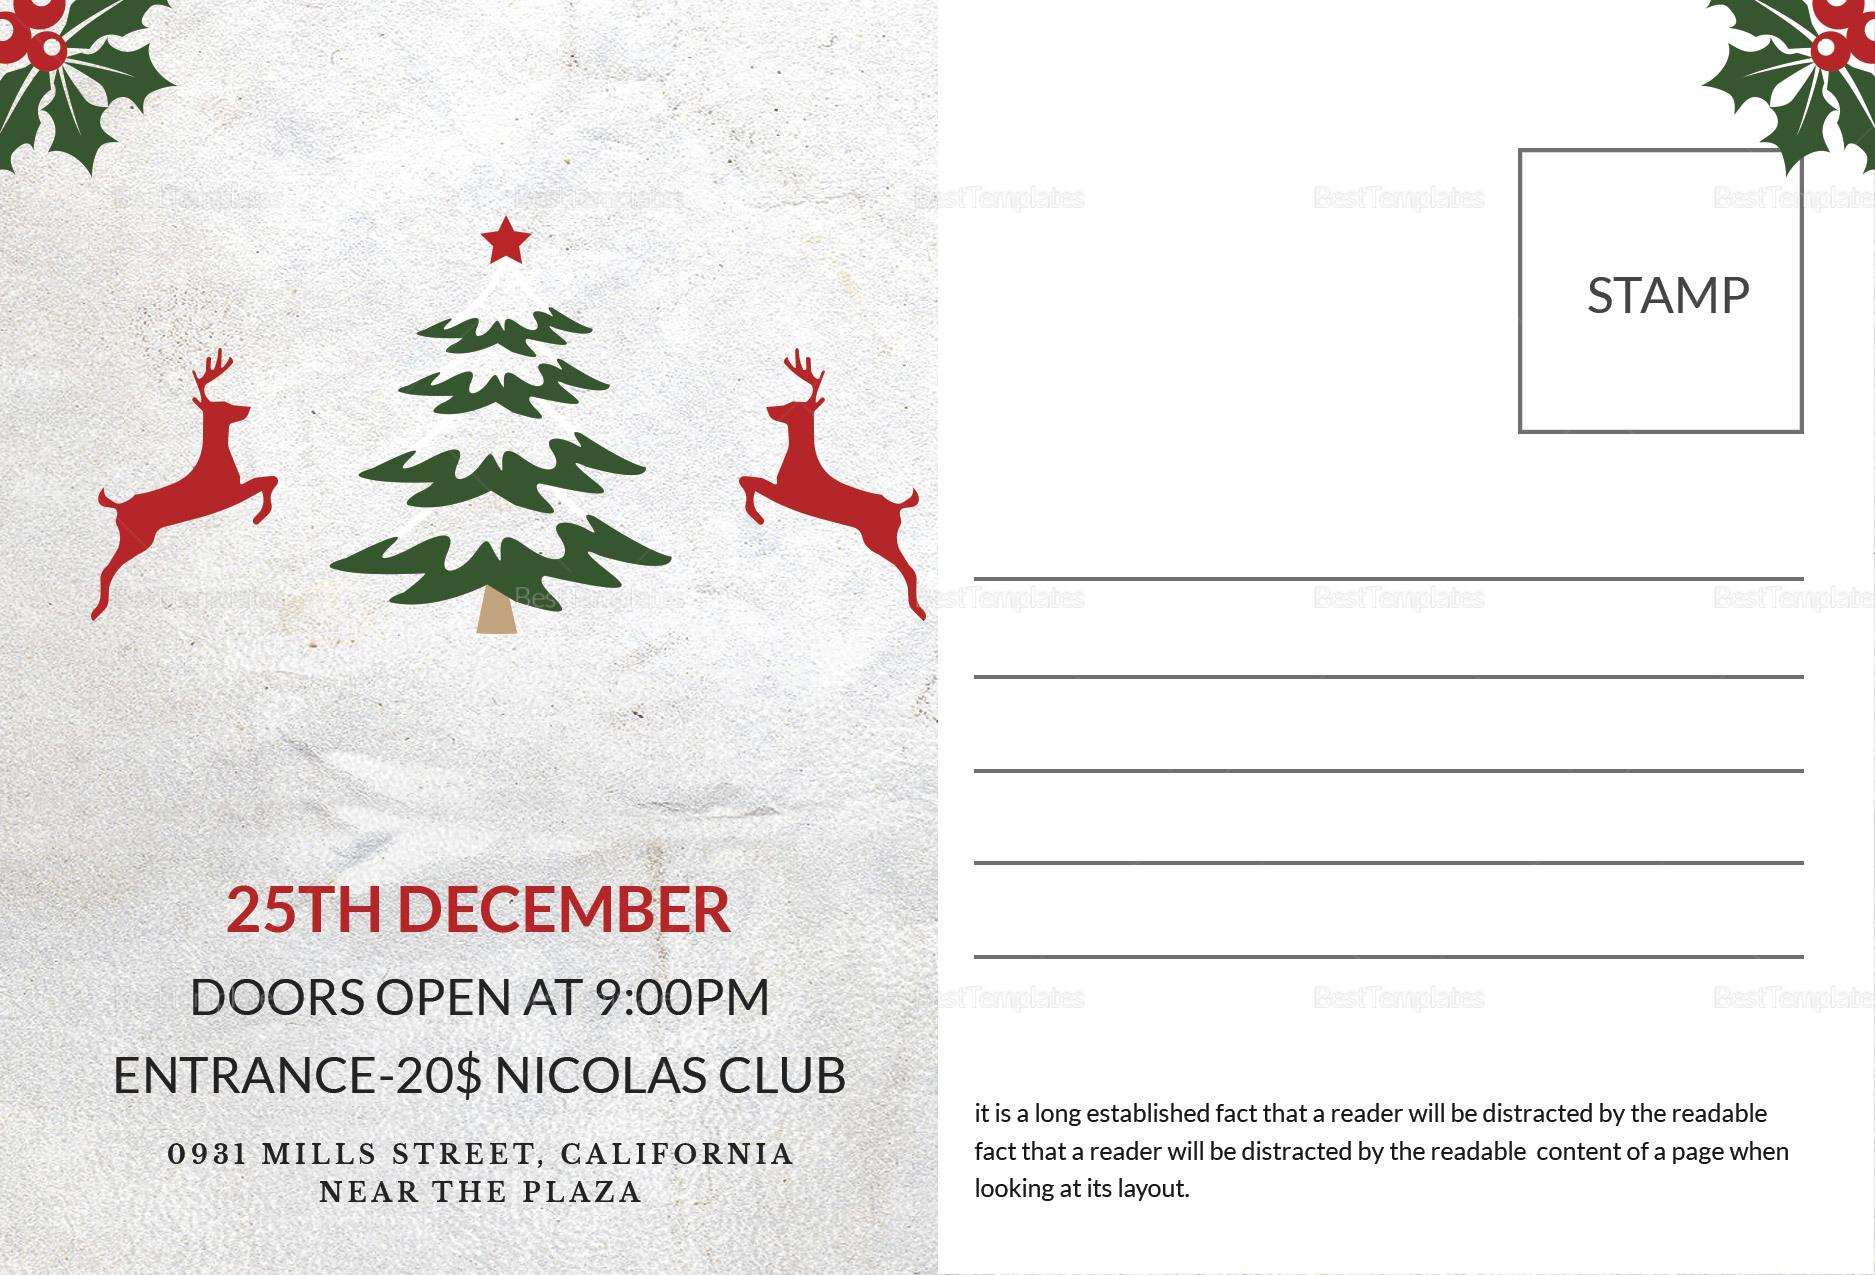 Printable Christmas Postcard Template In Adobe Photoshop